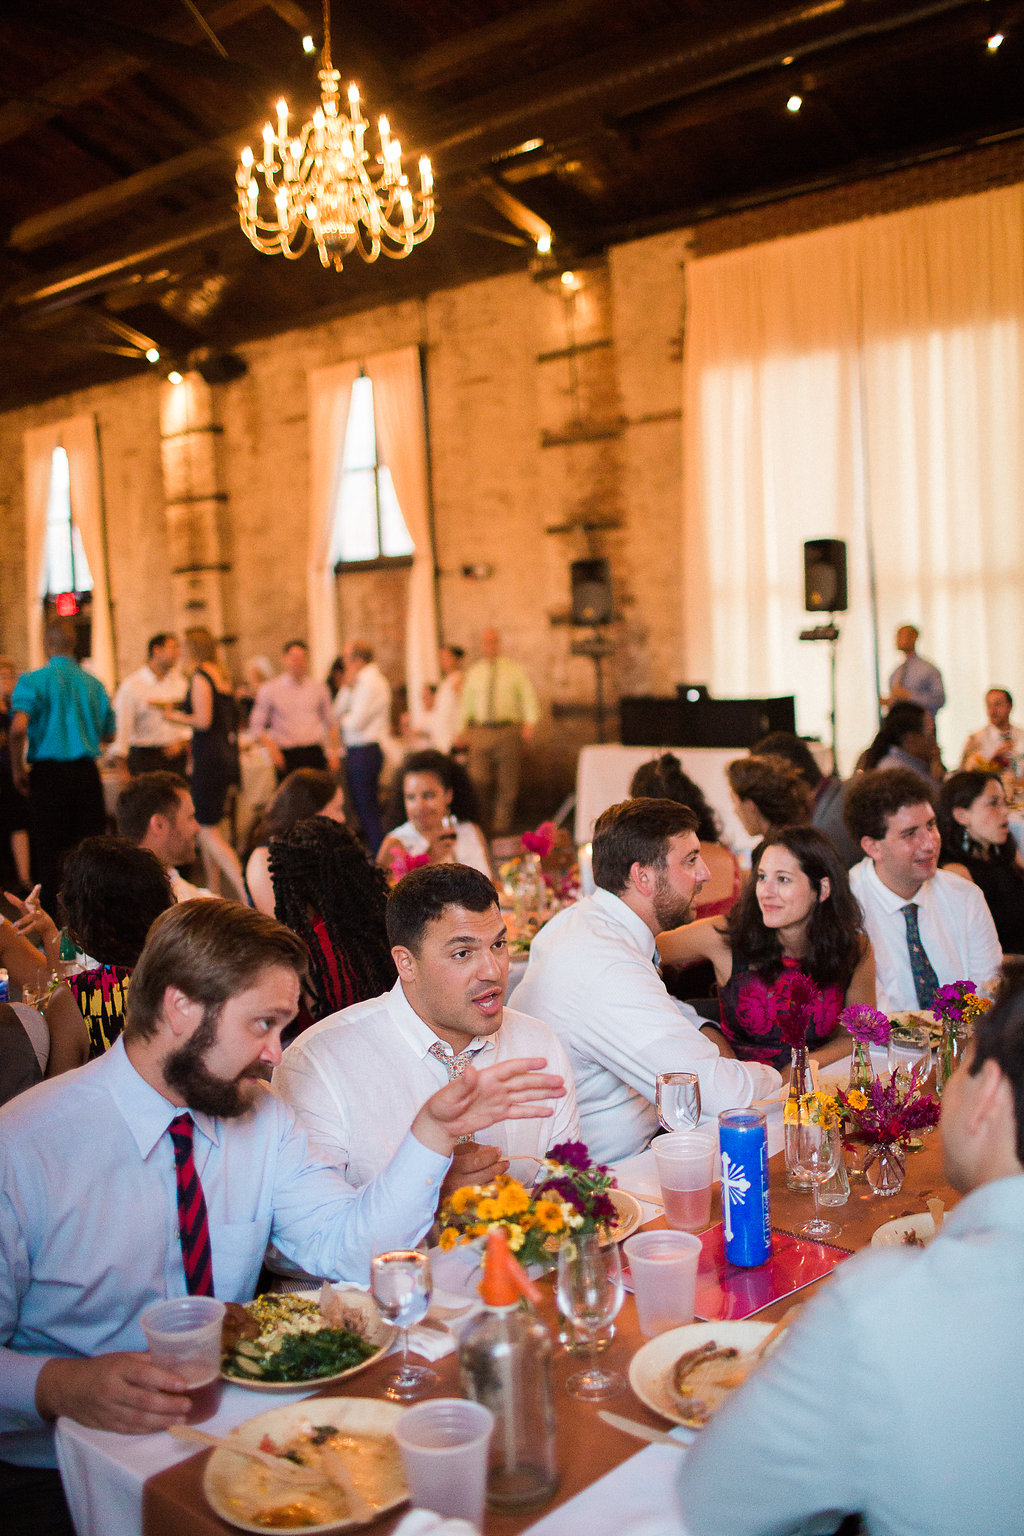 Rachel-Bill-Wedding-HazelPhoto-Paul-Gargagliano-736.jpg